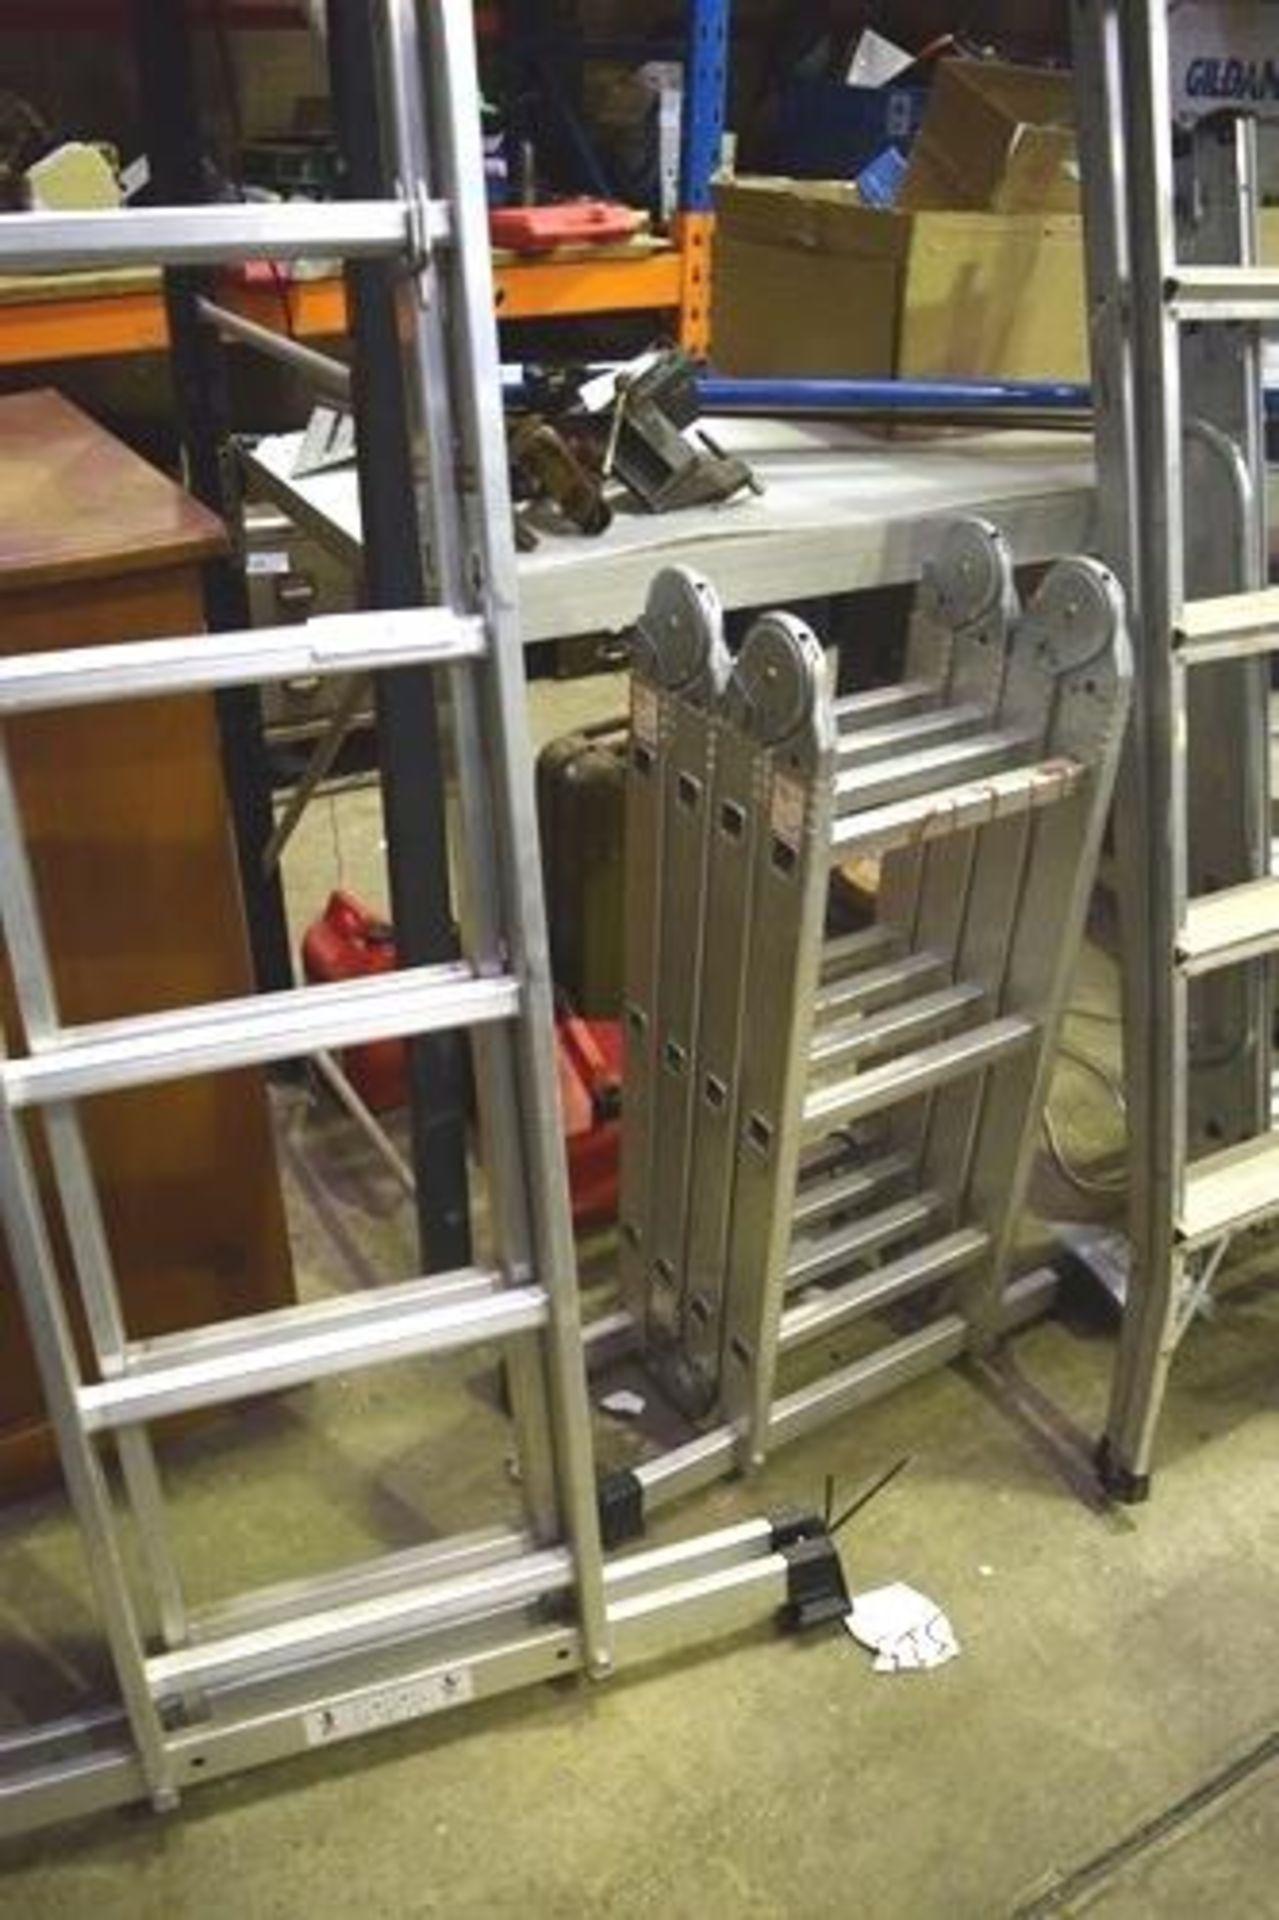 Lot 31 - 4 x assorted aluminium steps comprising 1 x GS LH701150, 1 x 4 section foldaway, 1 x 5 tread folding